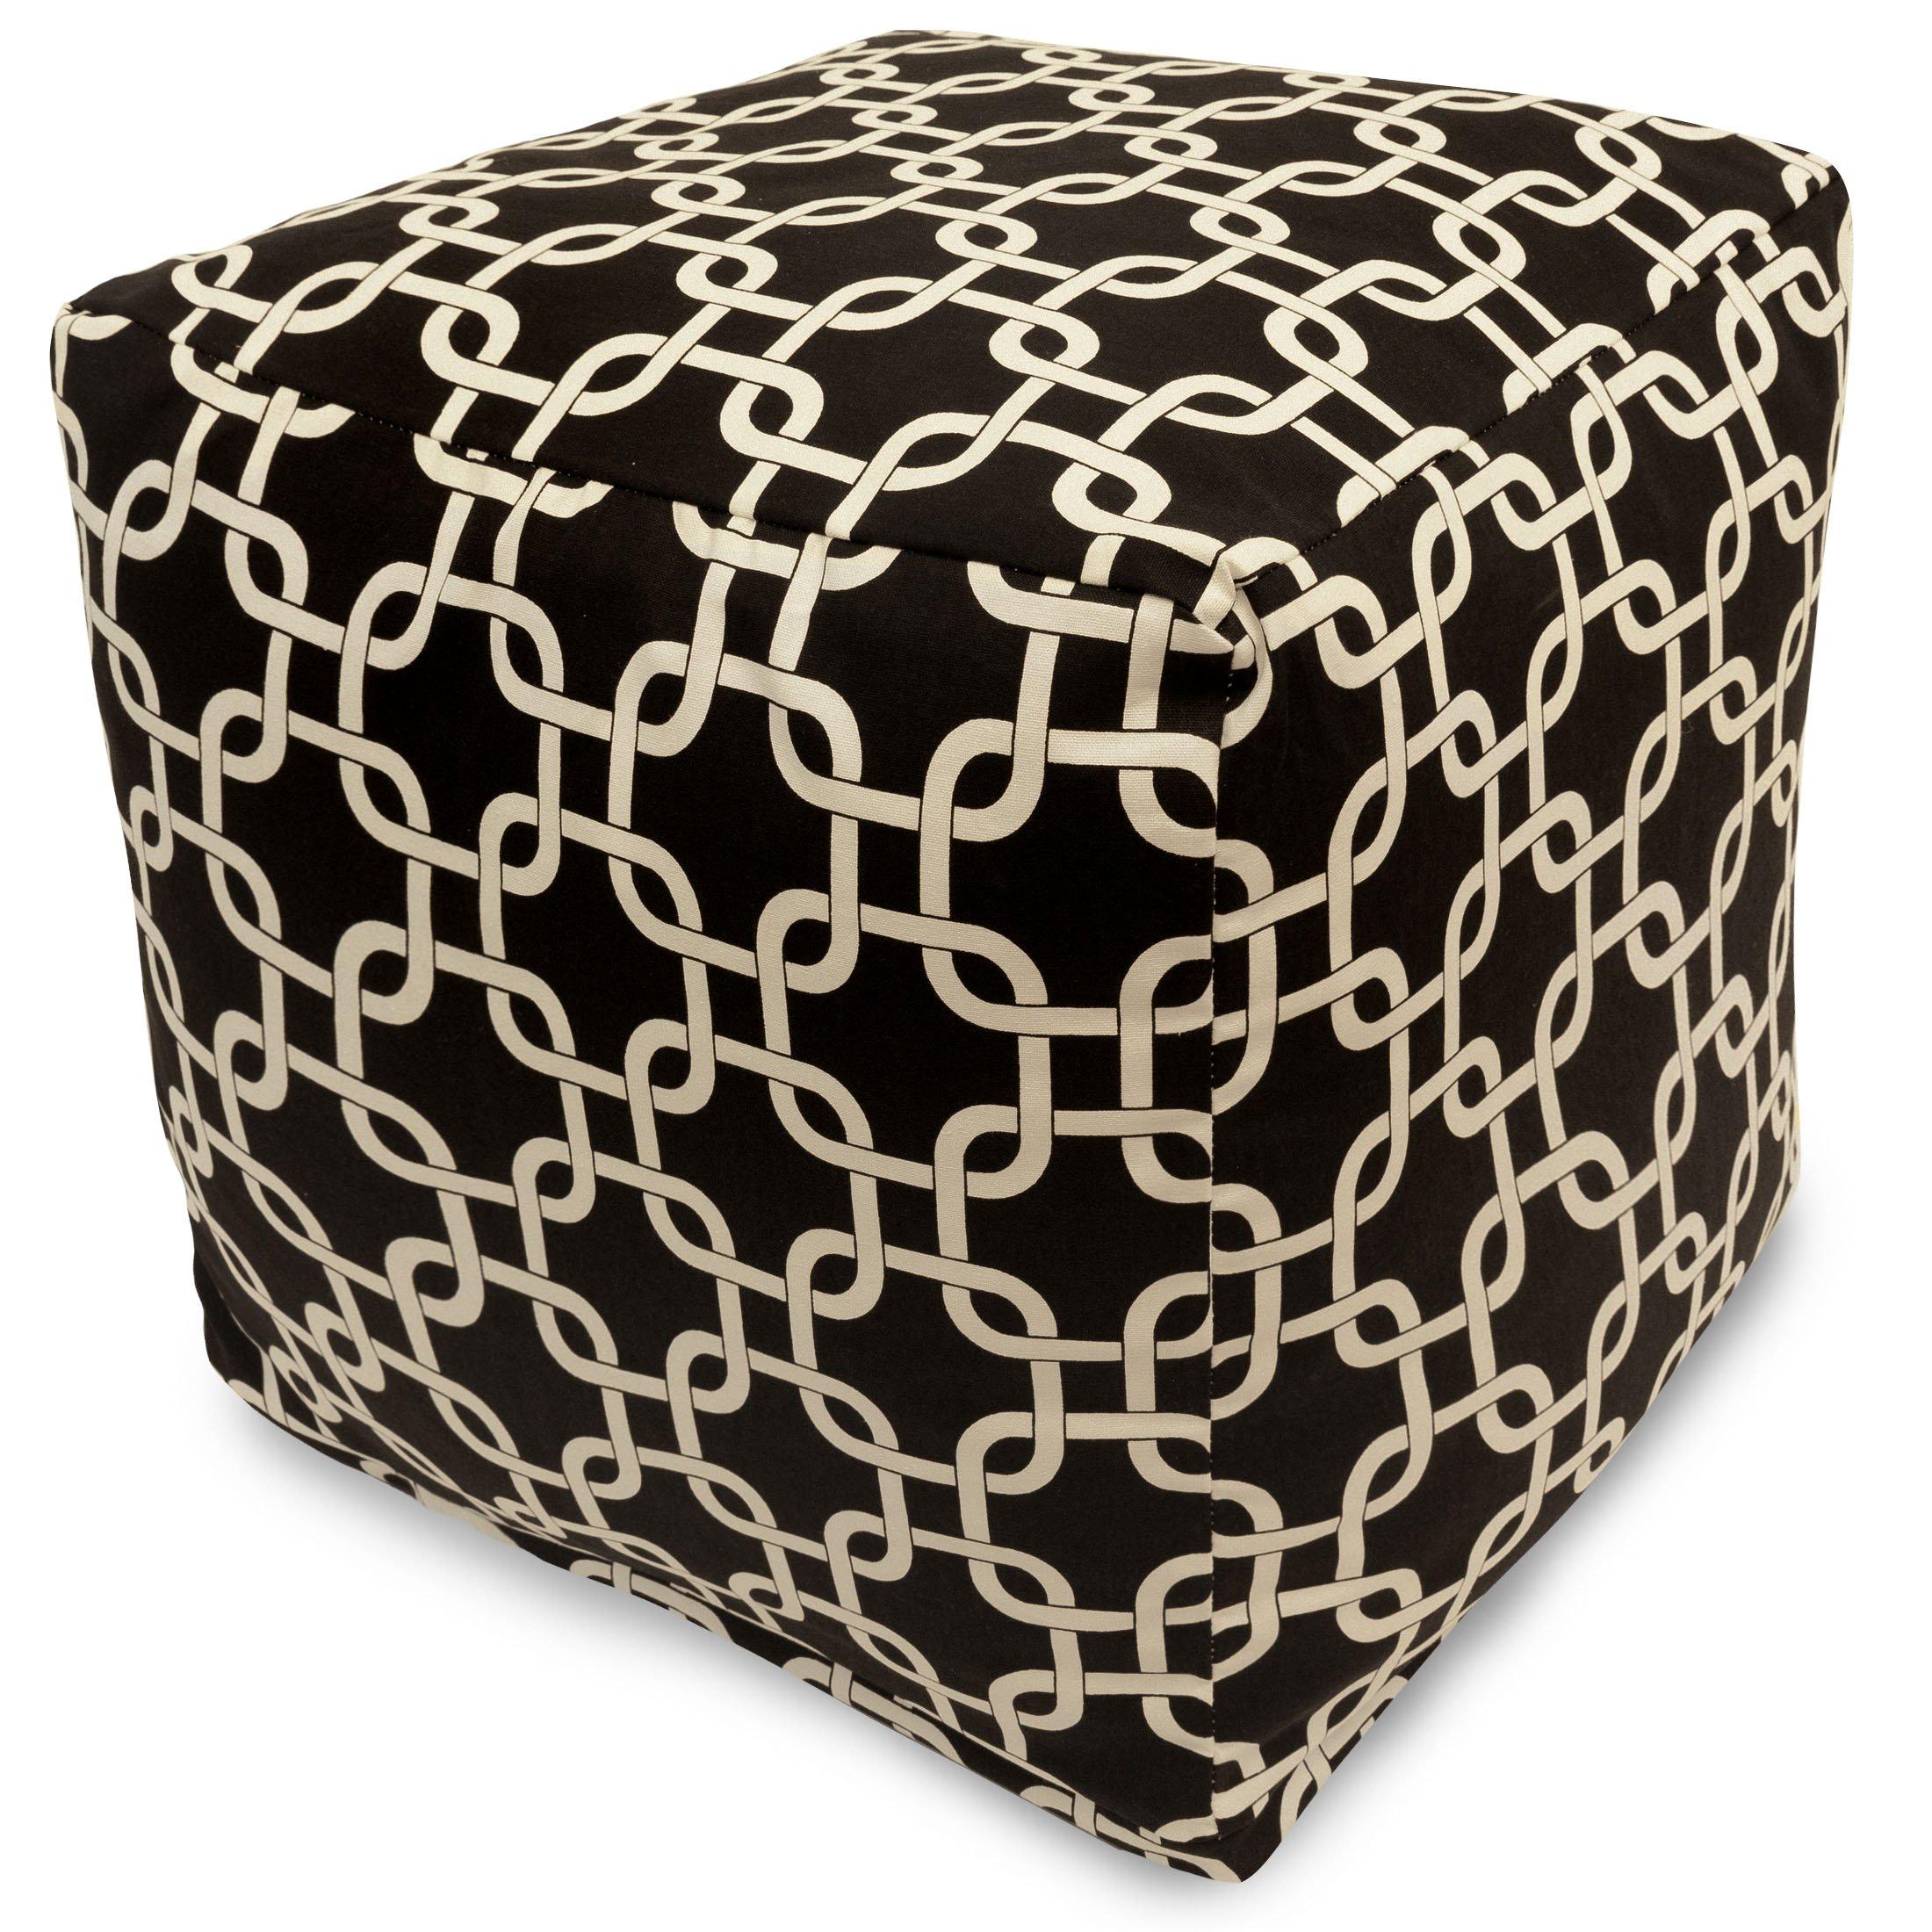 Majestic Home Goods Links Indoor/Outdoor Bean Bag Ottoman Pouf Cube, 17'' x 17'' x 17'' (Black)